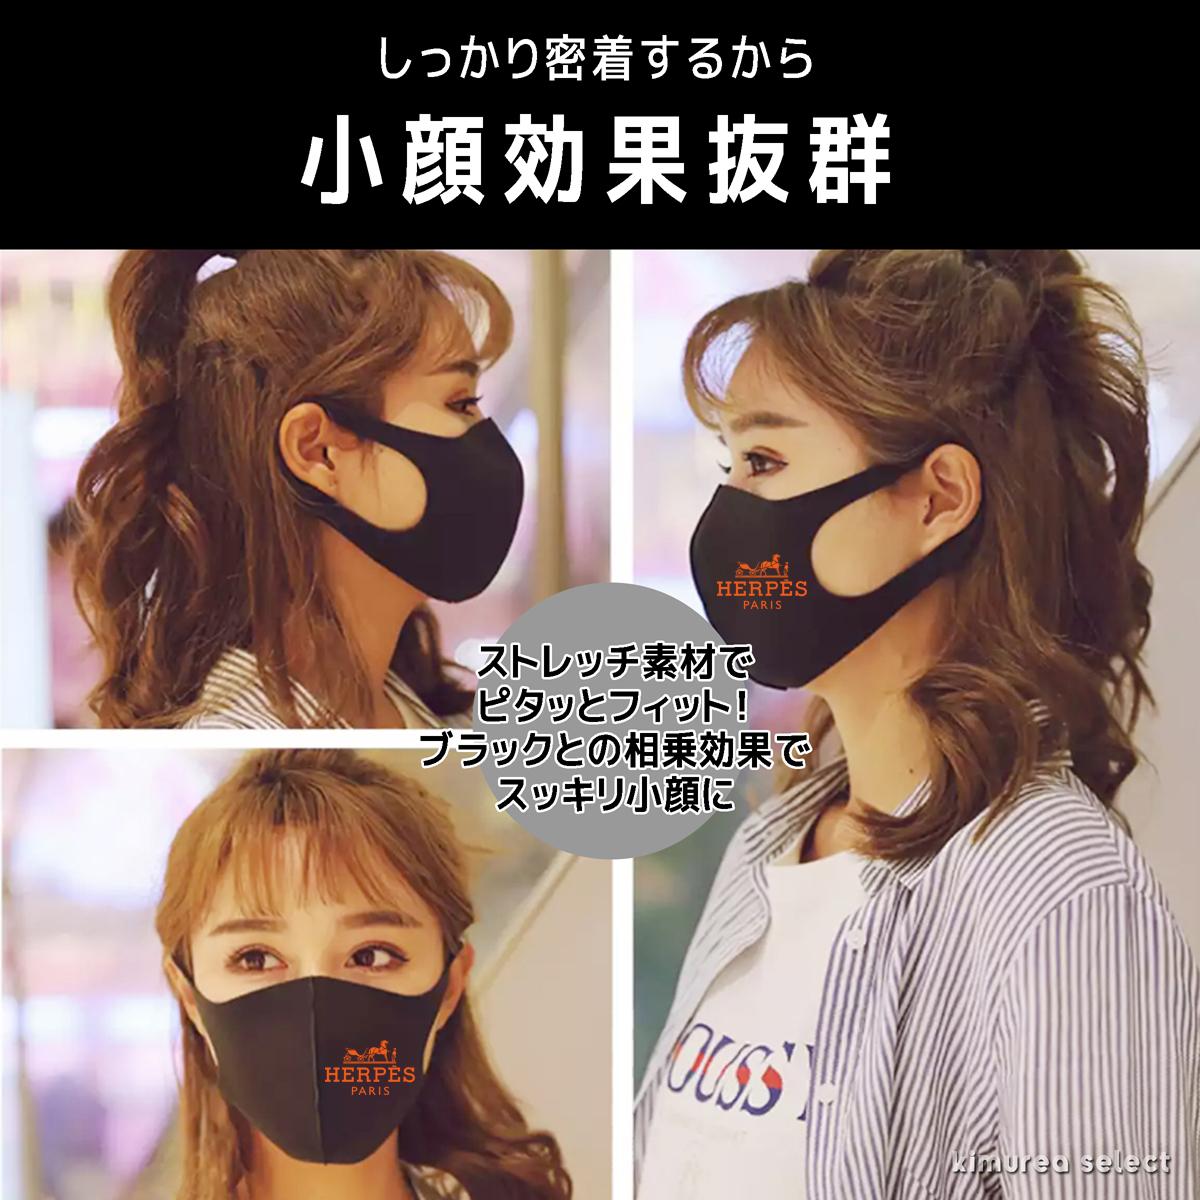 Hermes 3D Washable breathable sport Coronavirus Cotton Masks